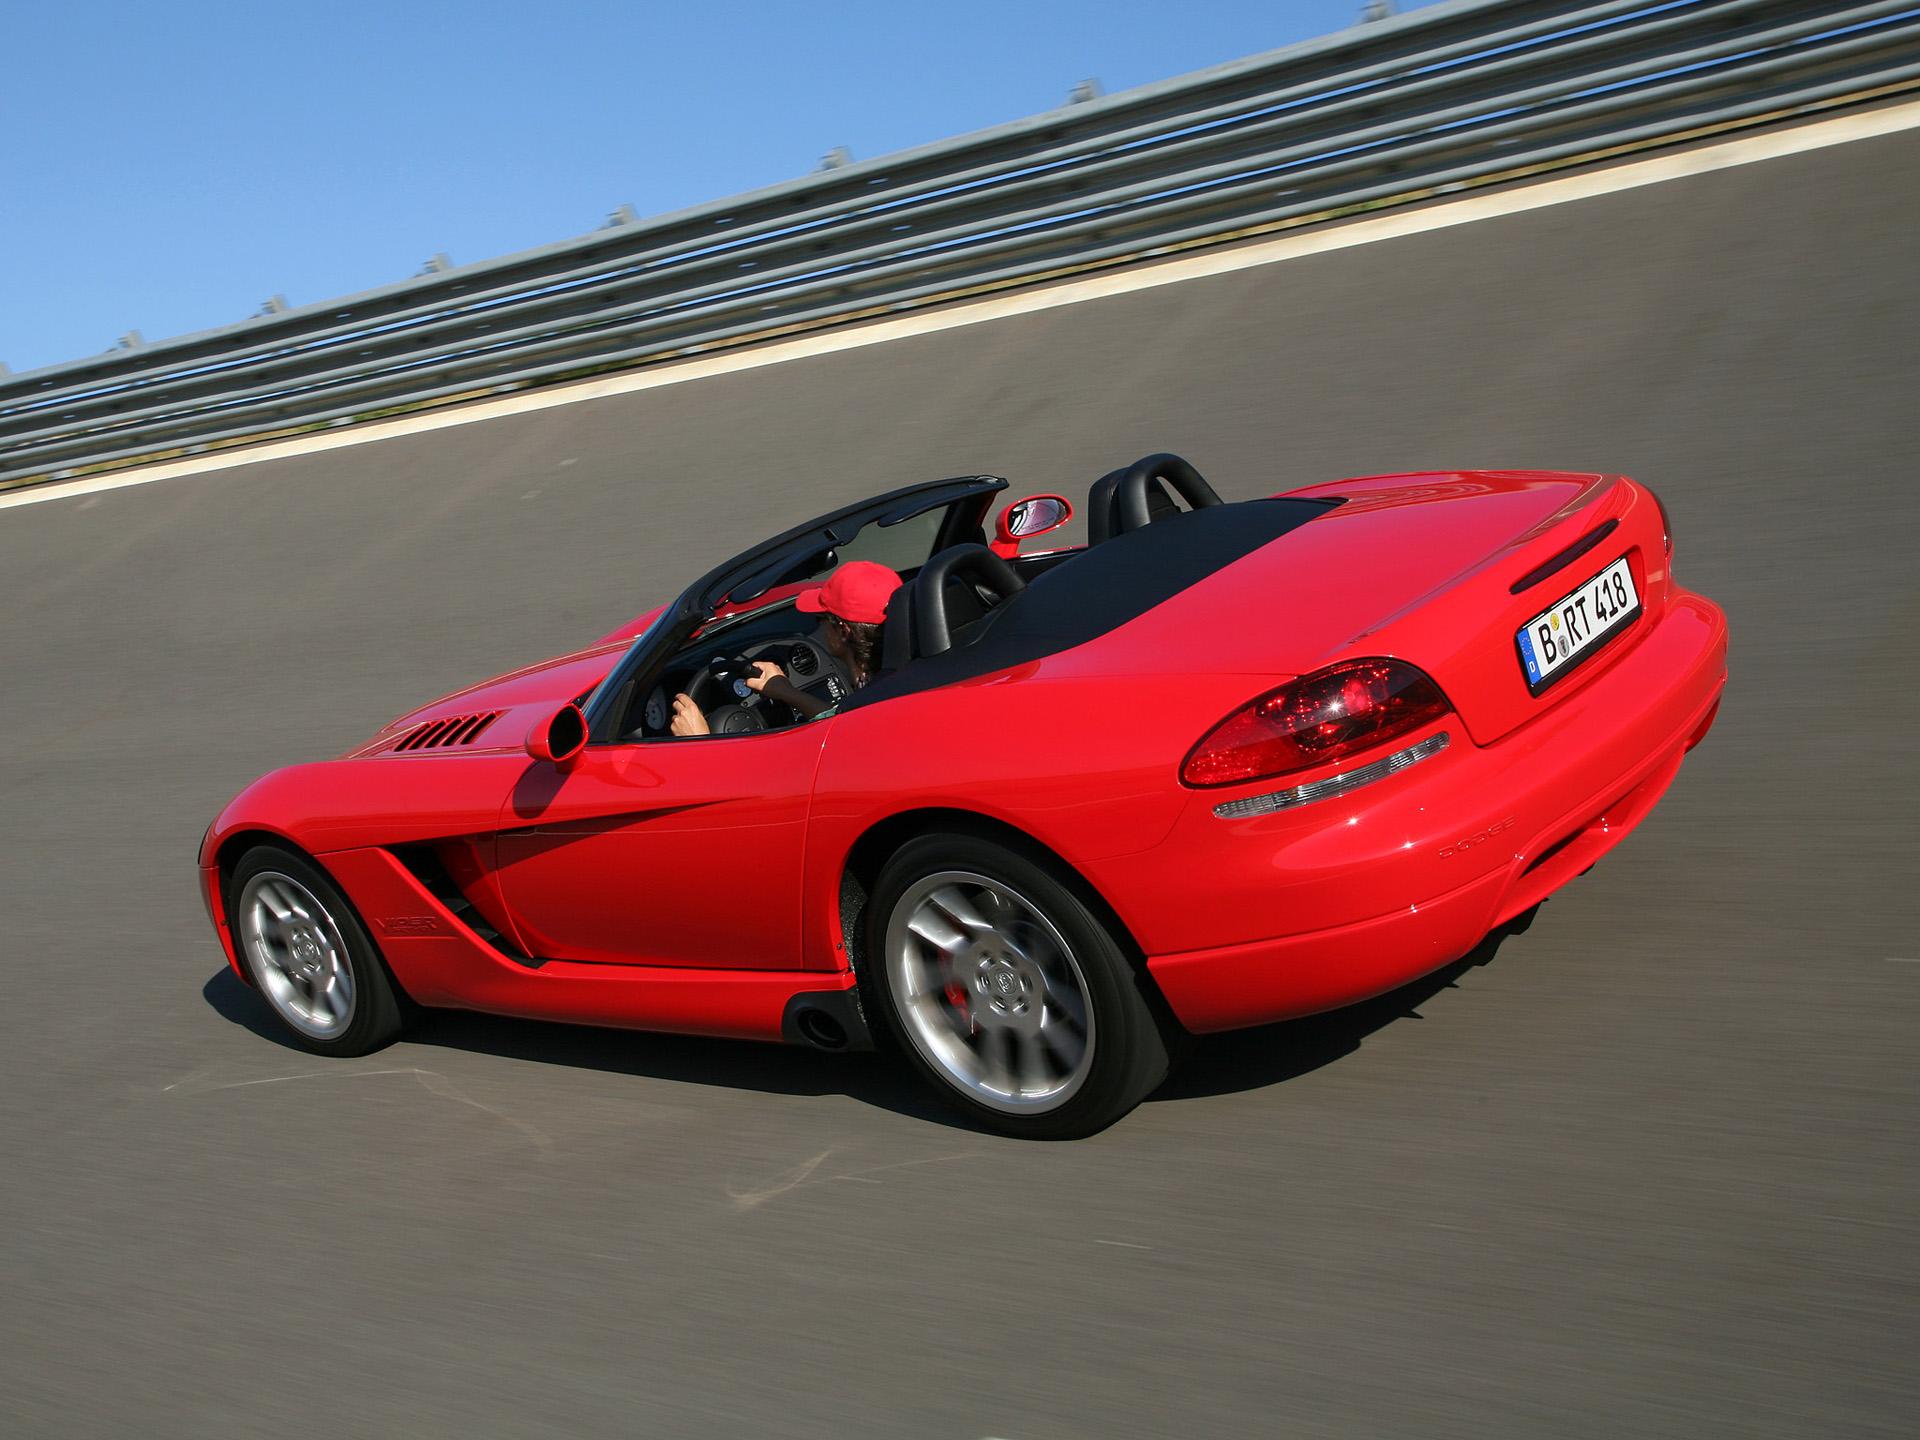 2003 Dodge Viper Srt10 Convertible Supercar Muscle Te Wallpaper 1920x1440 154924 Wallpaperup